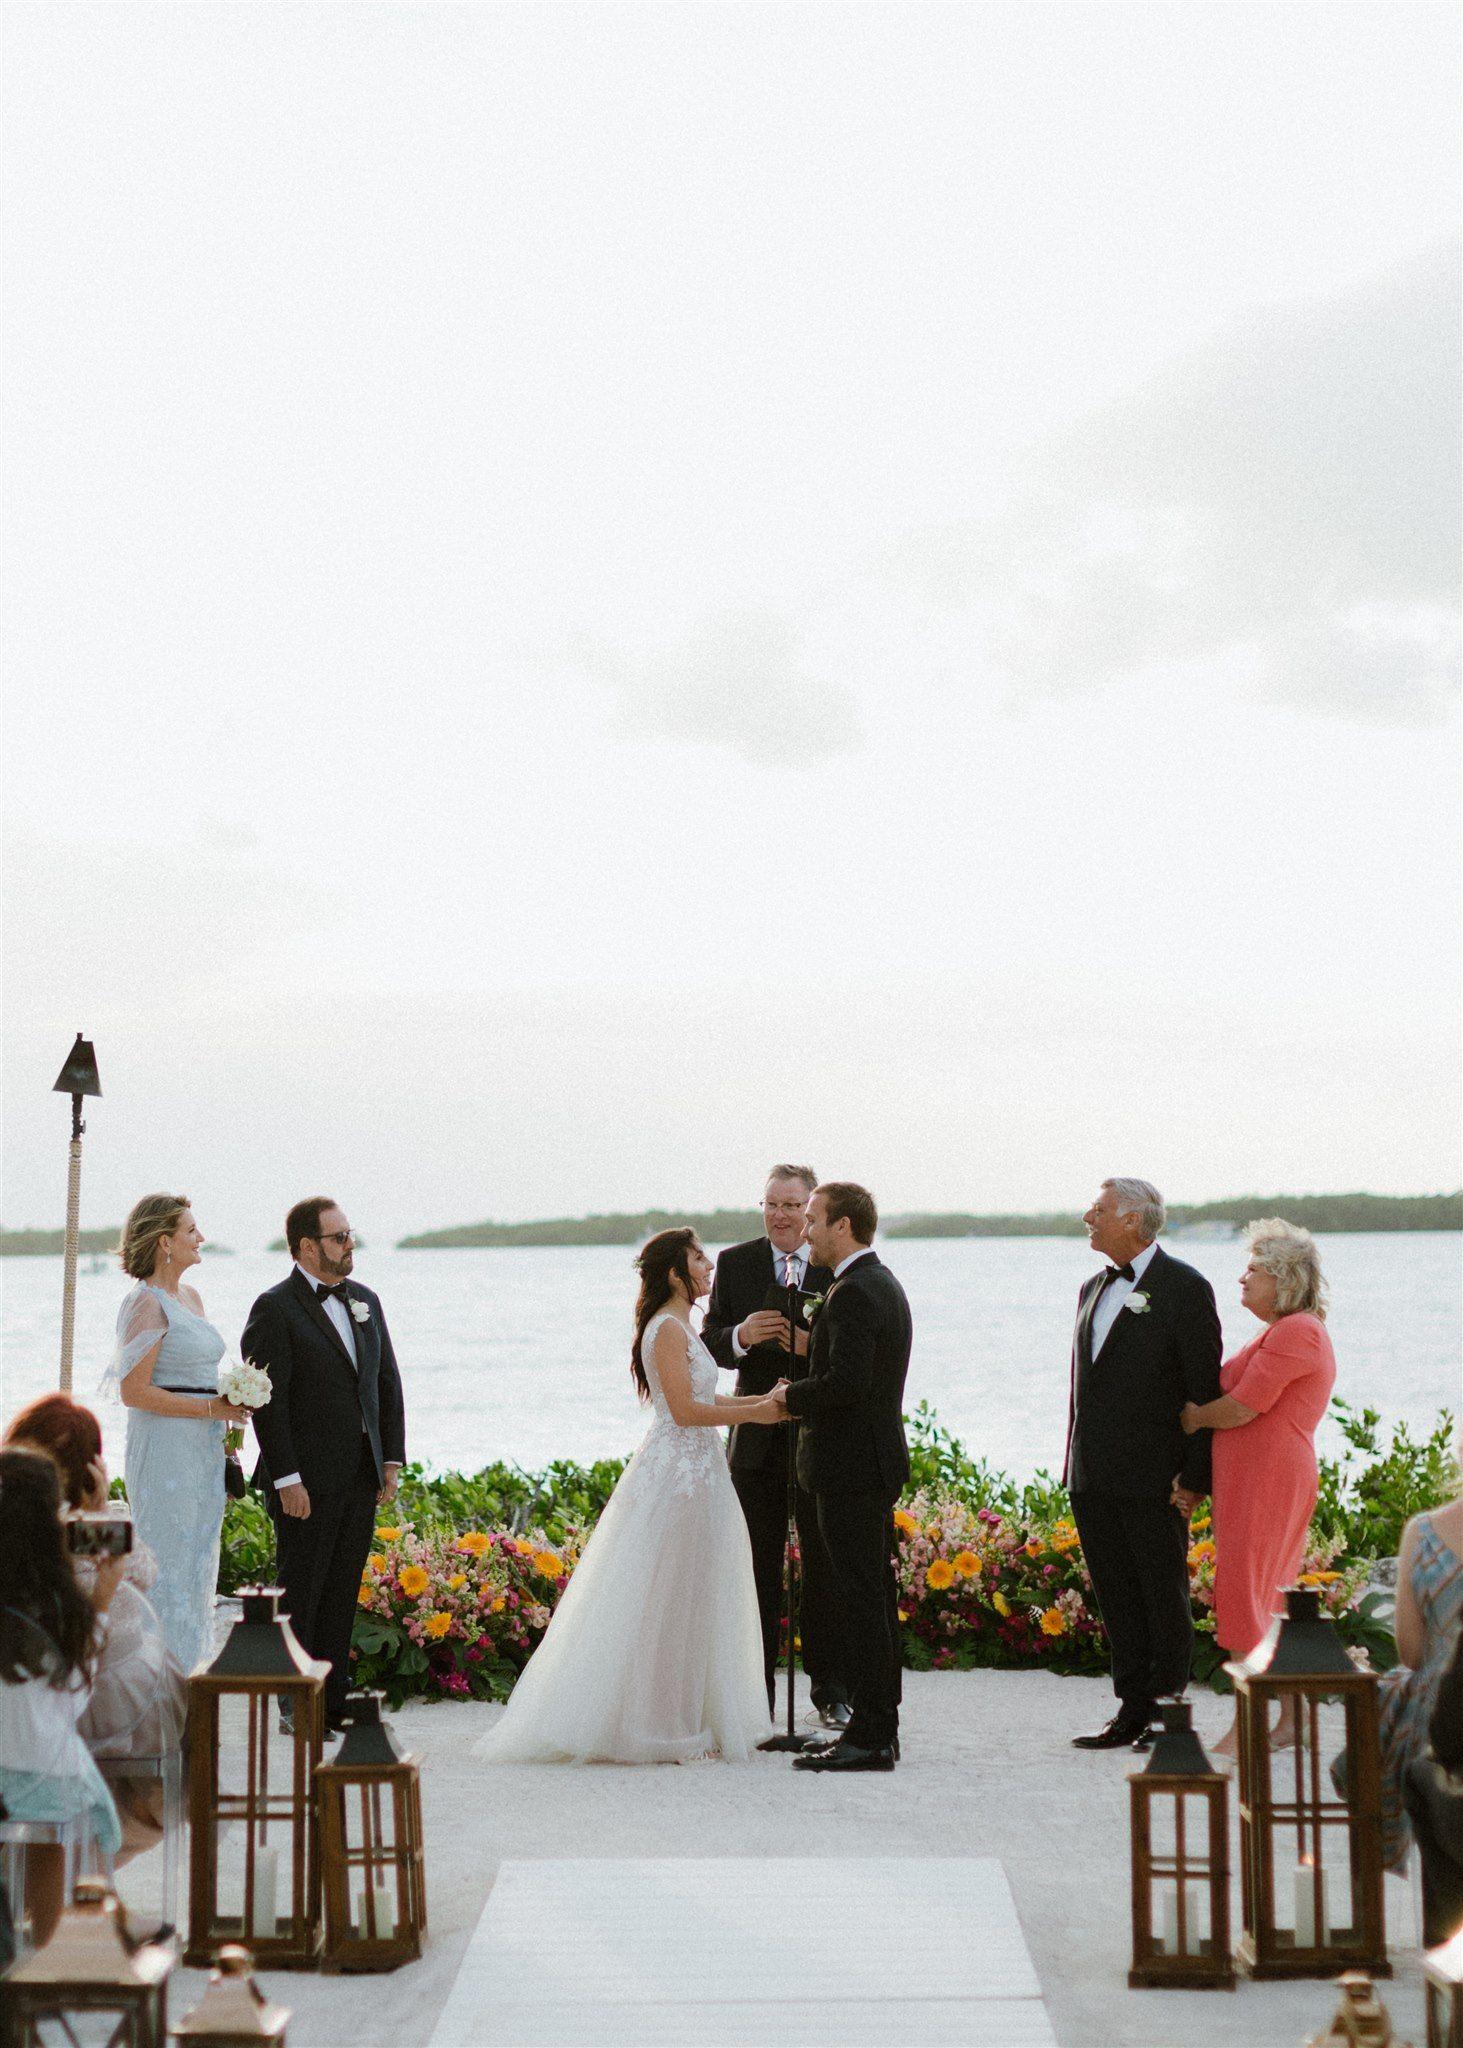 Morada Bay wedding ceremony